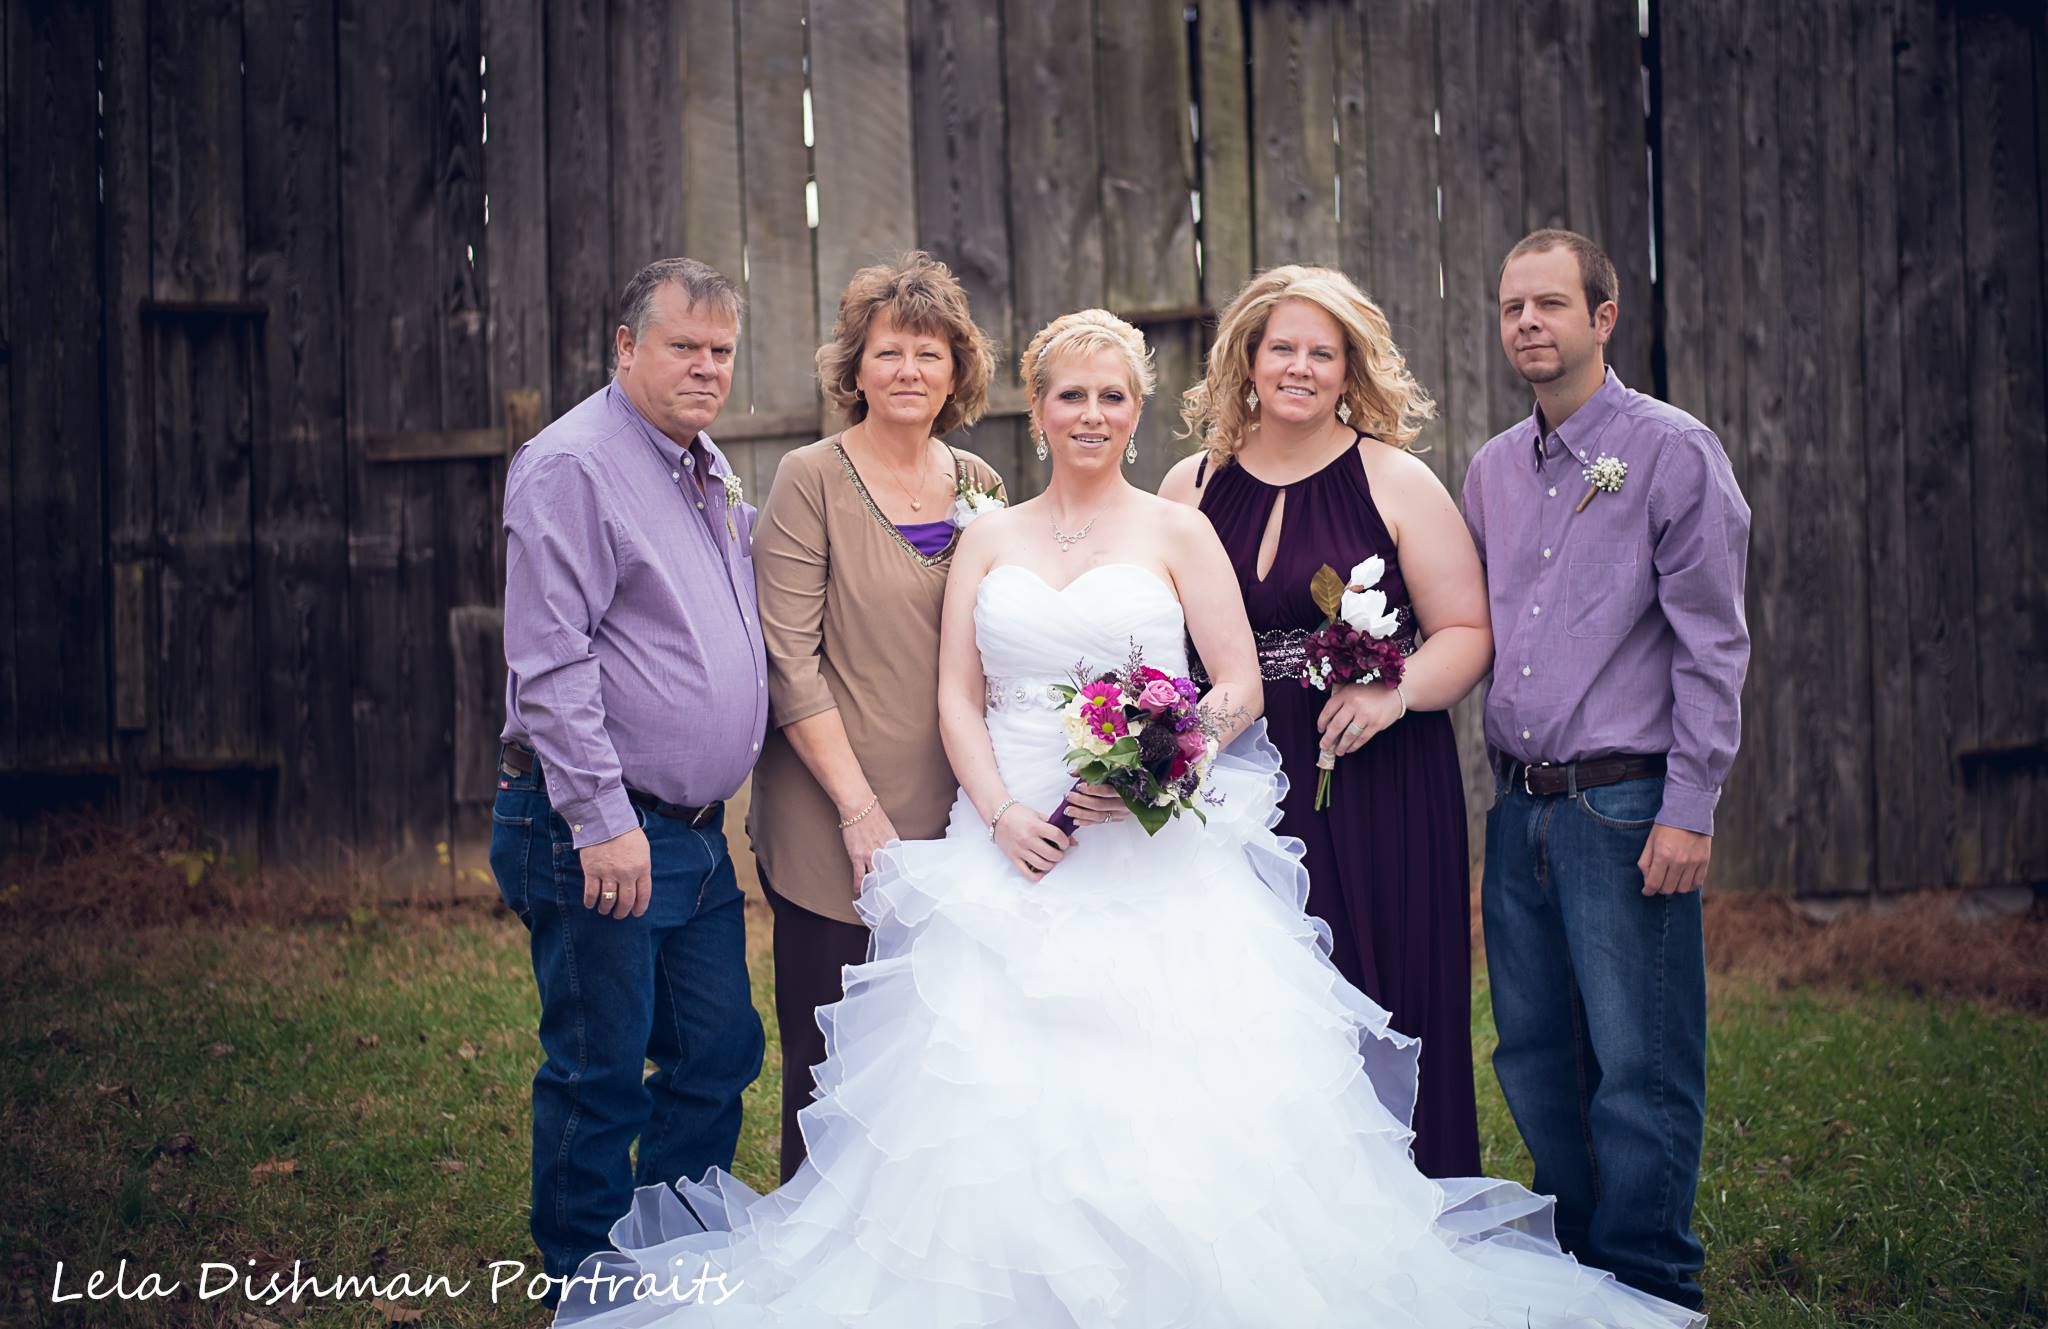 somerset ky wedding photography